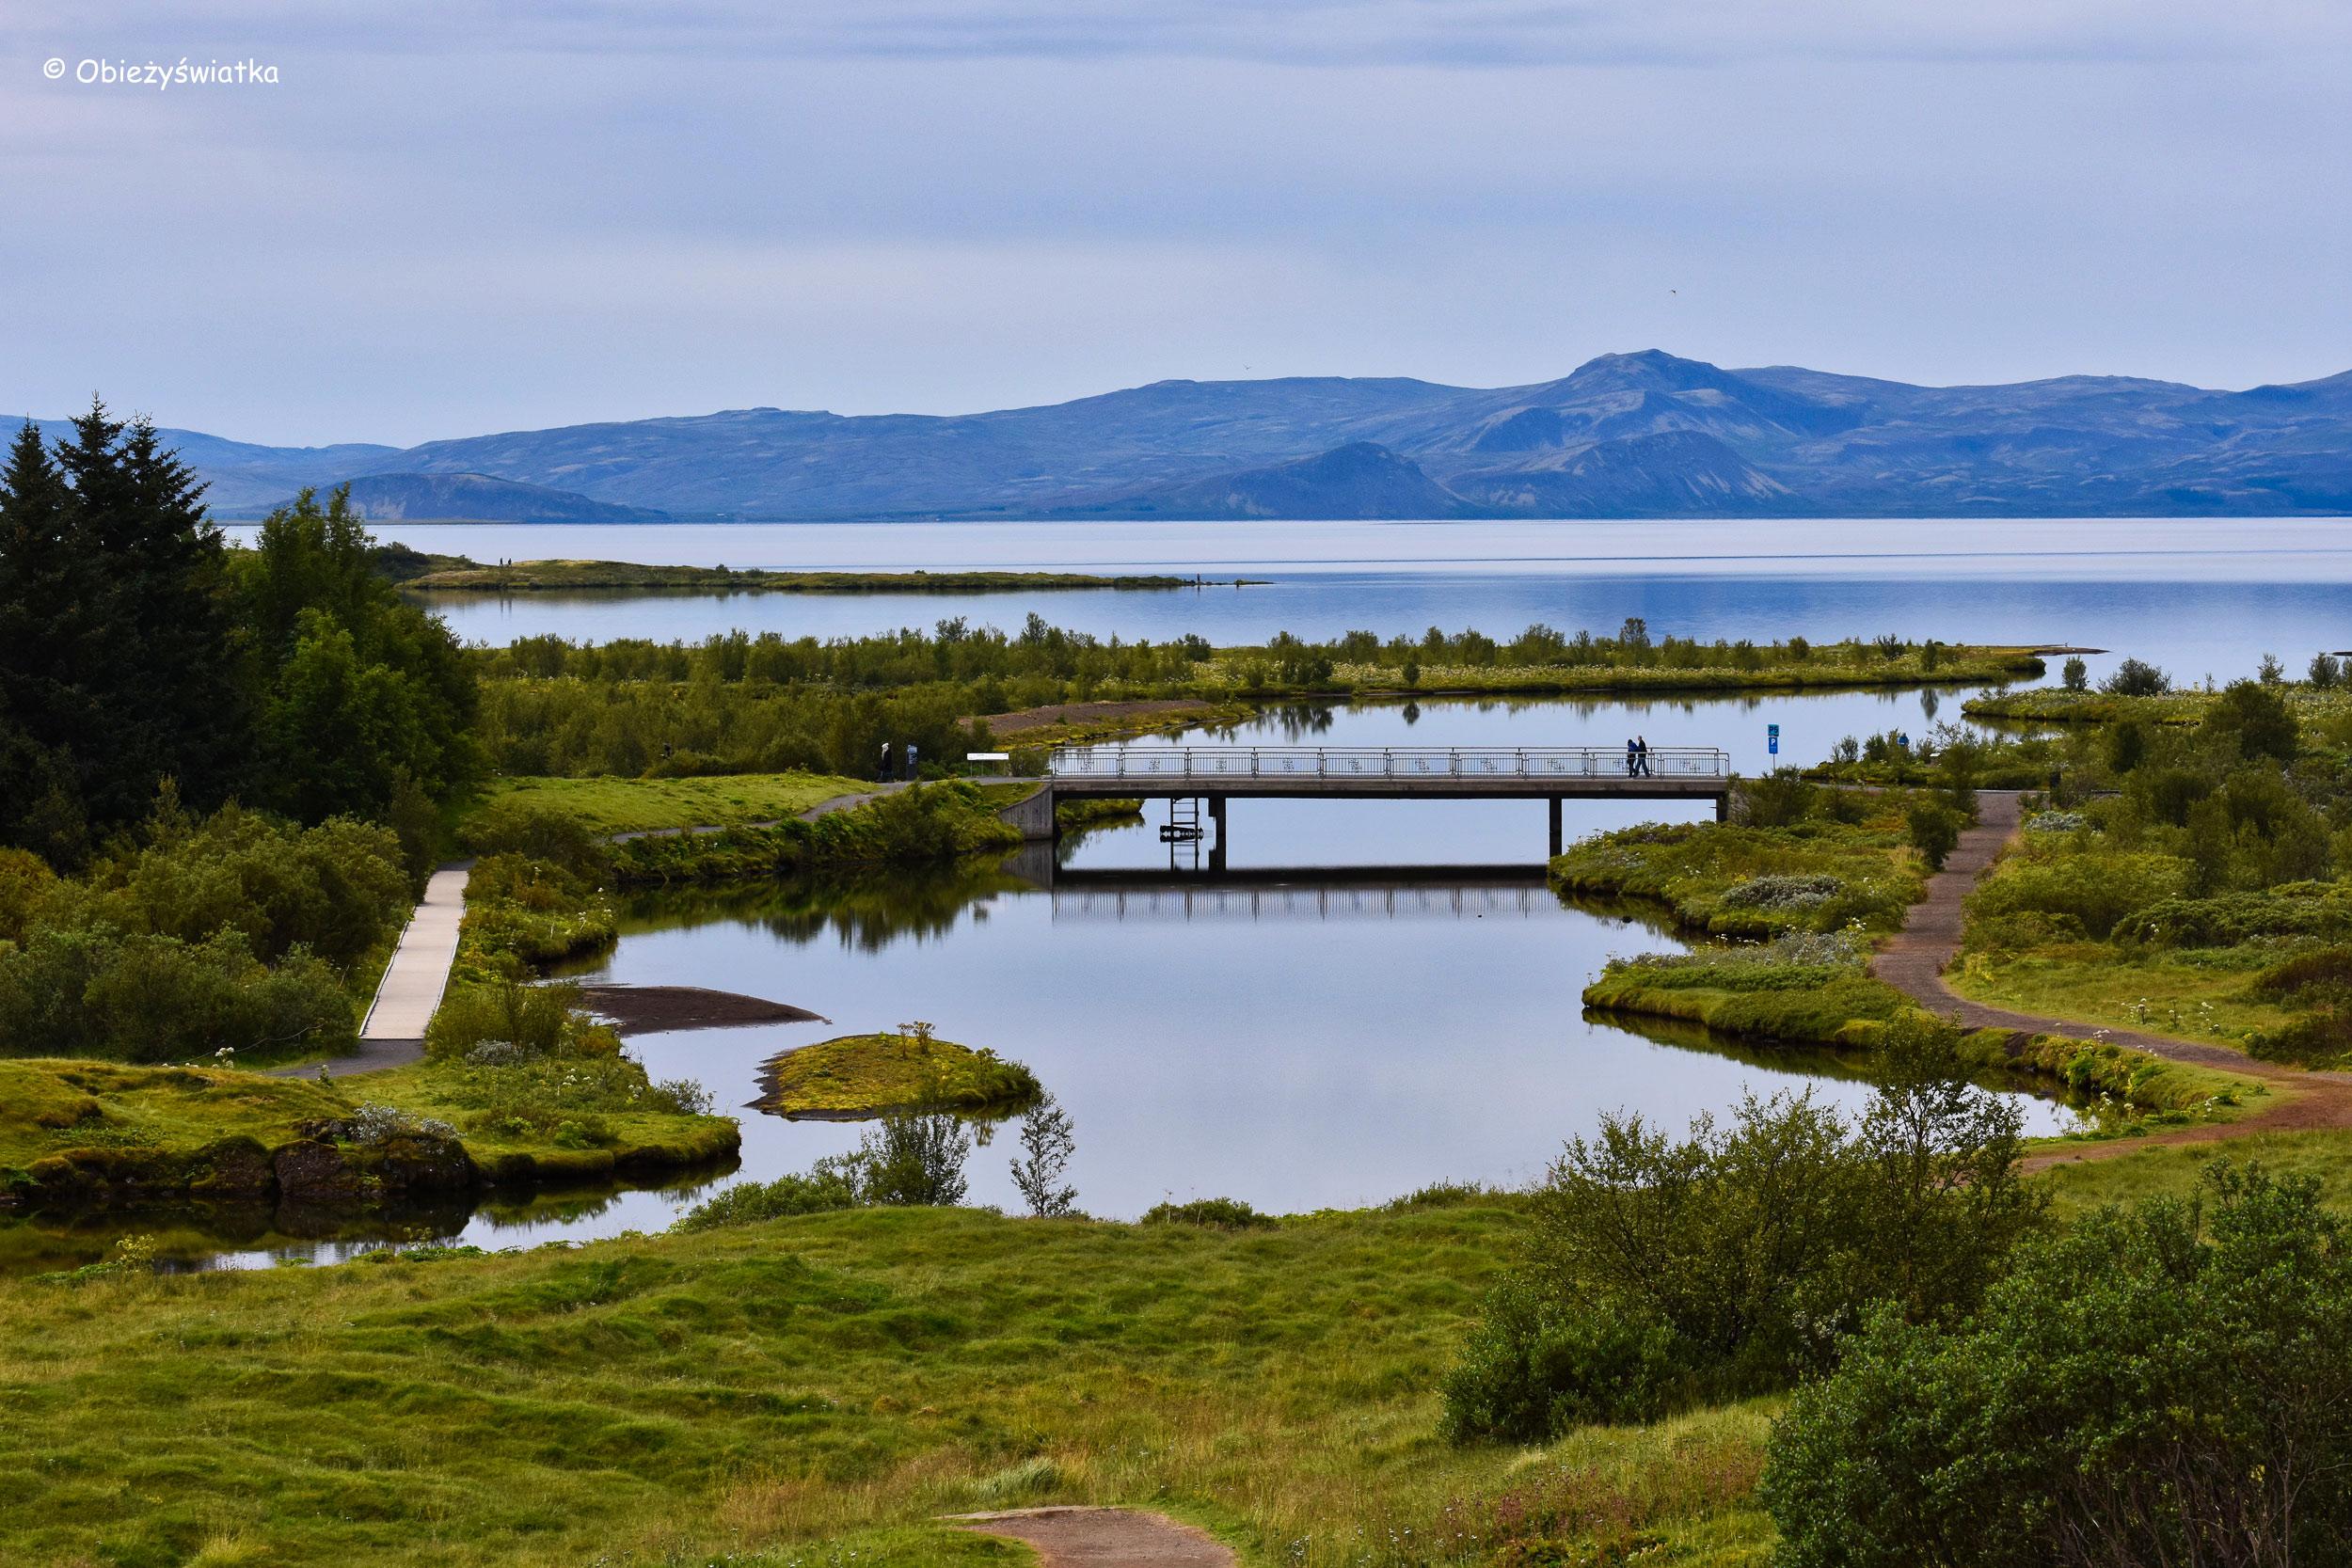 Woda, woda, woda - Þingvellir, Islandia